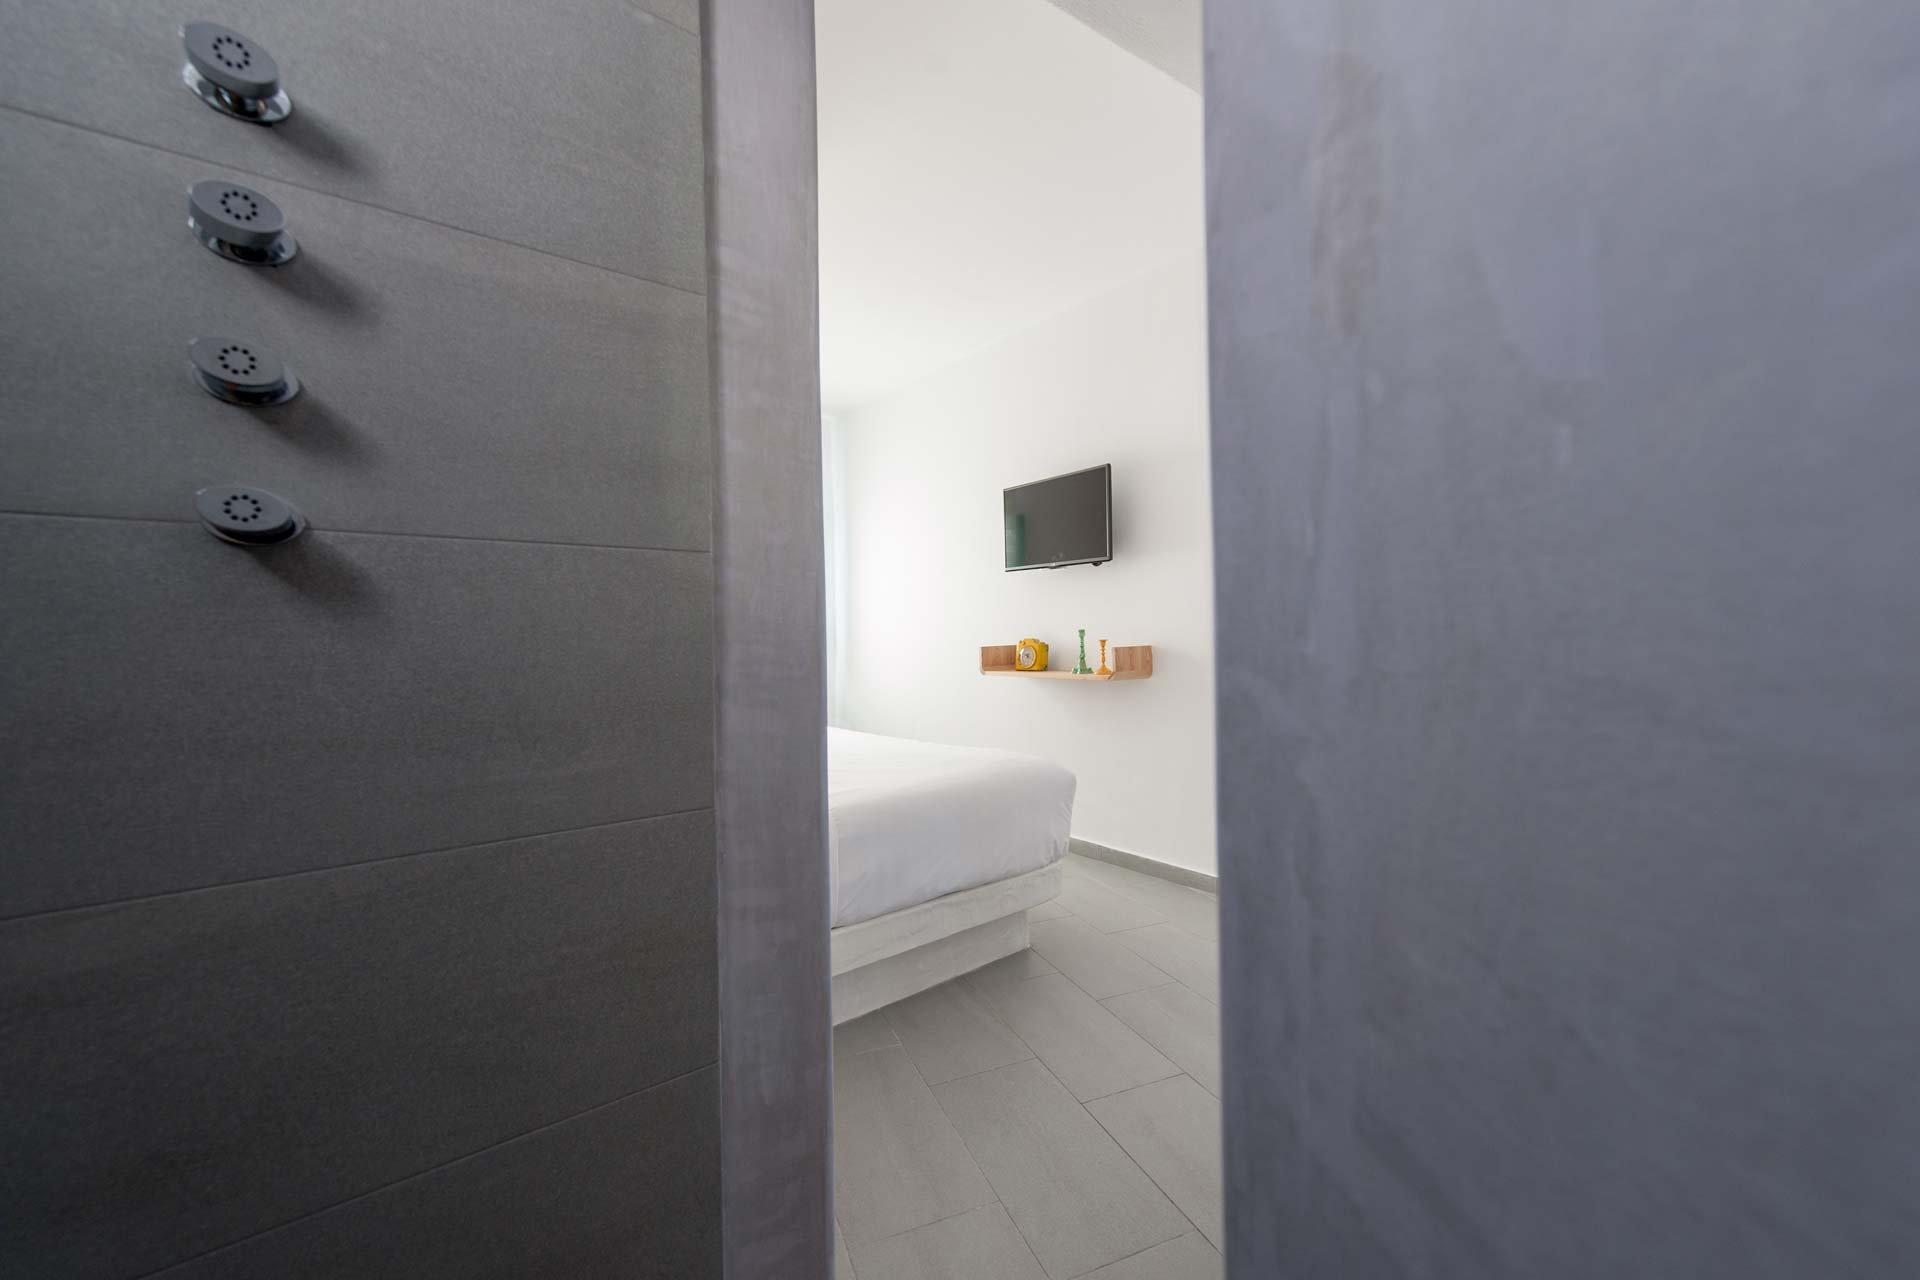 Premium Spa Suite - Hydromassage in shower